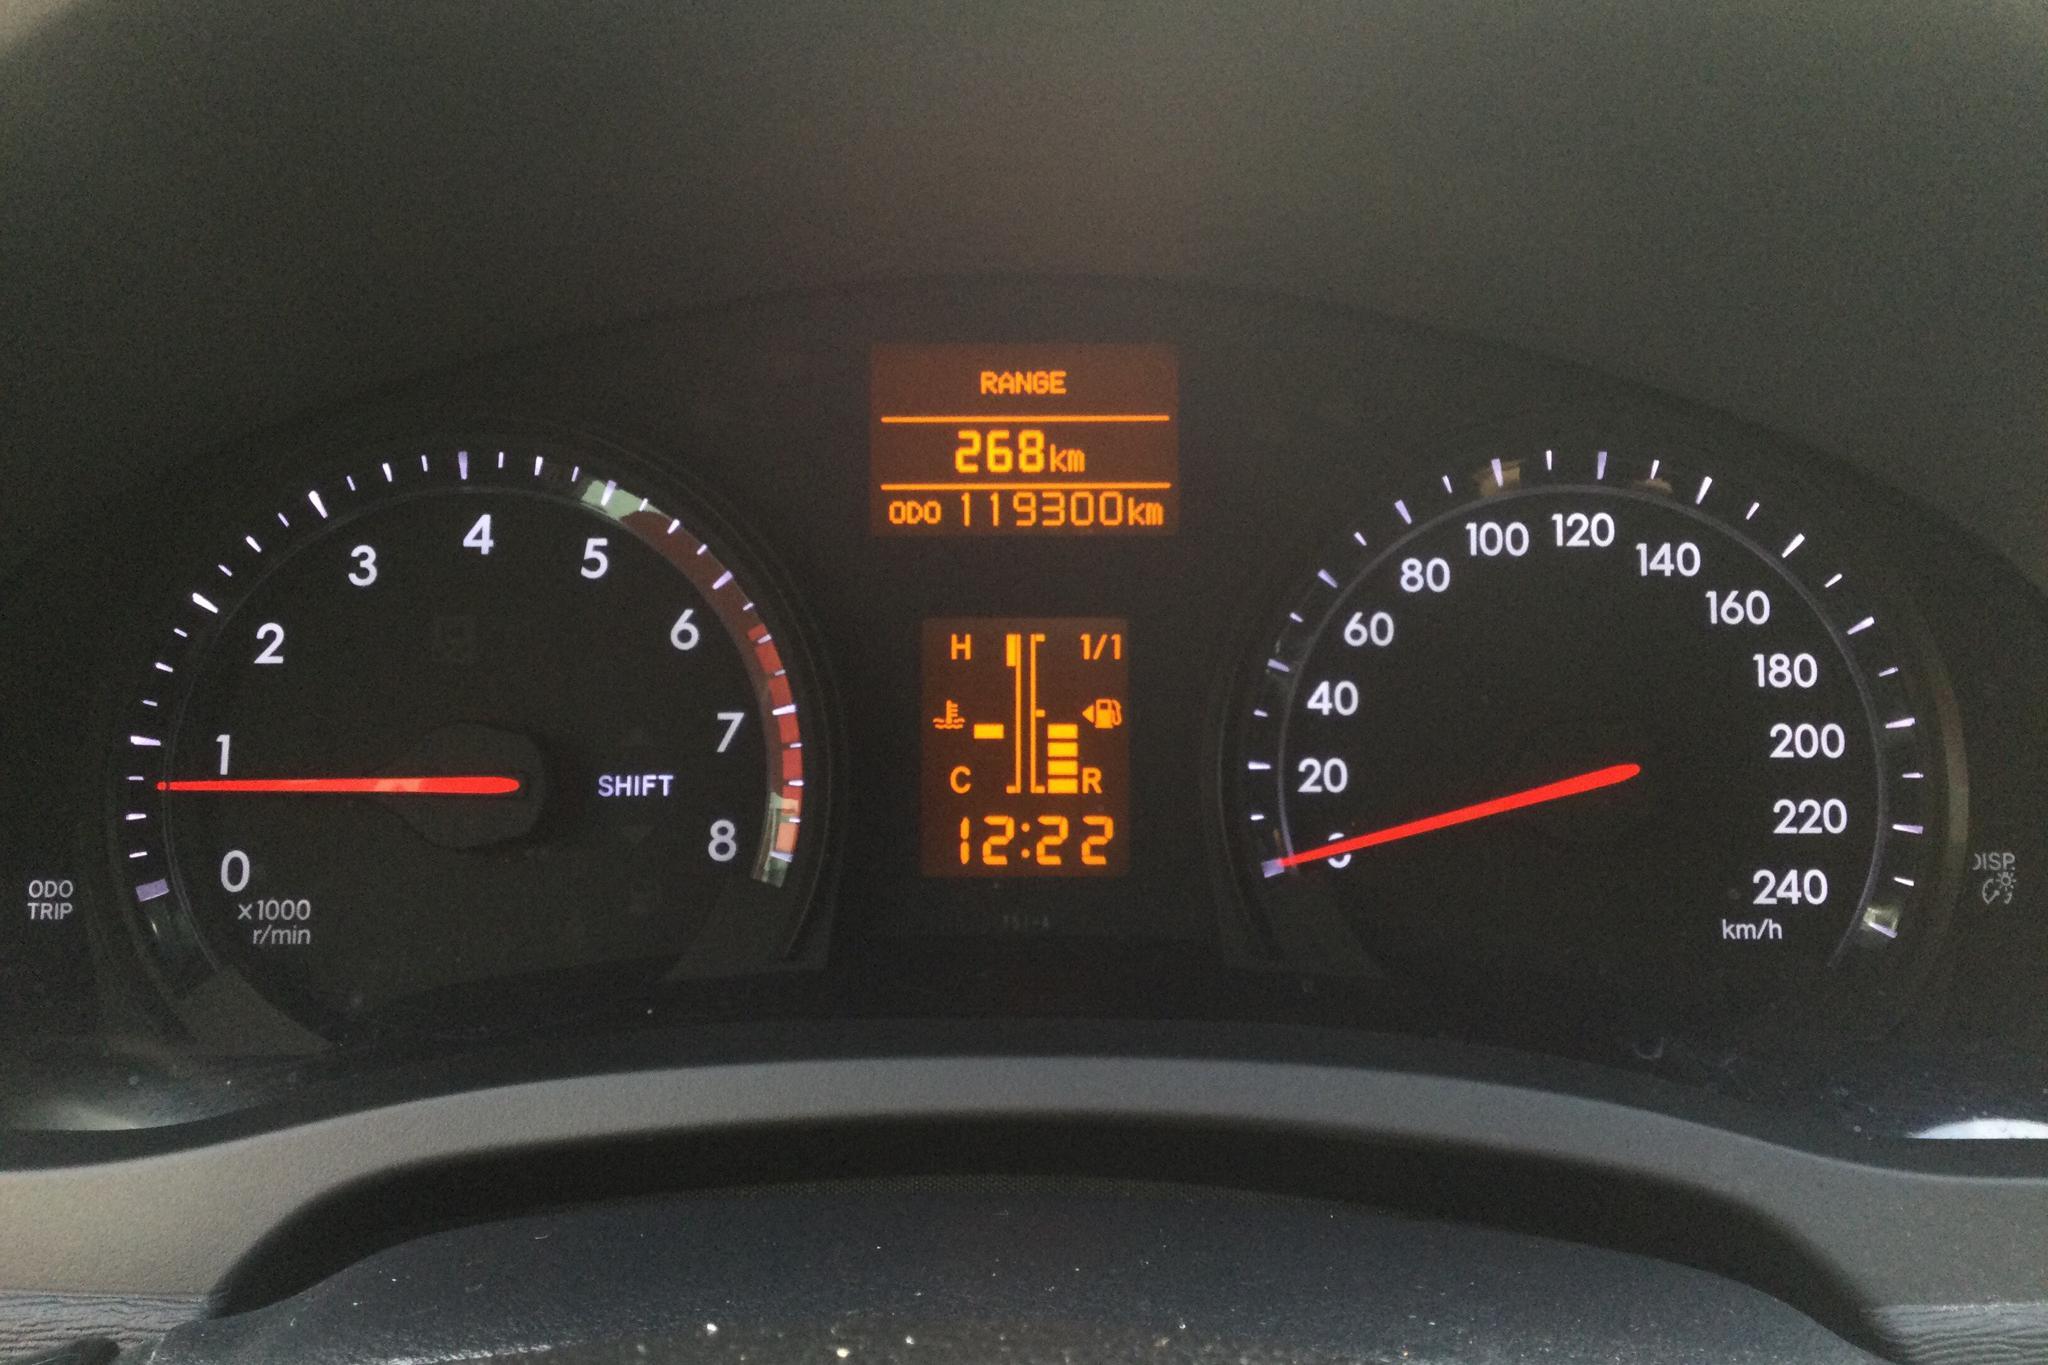 Toyota Avensis 2.0 Kombi (152hk) - 119 300 km - Manual - Light Grey - 2013